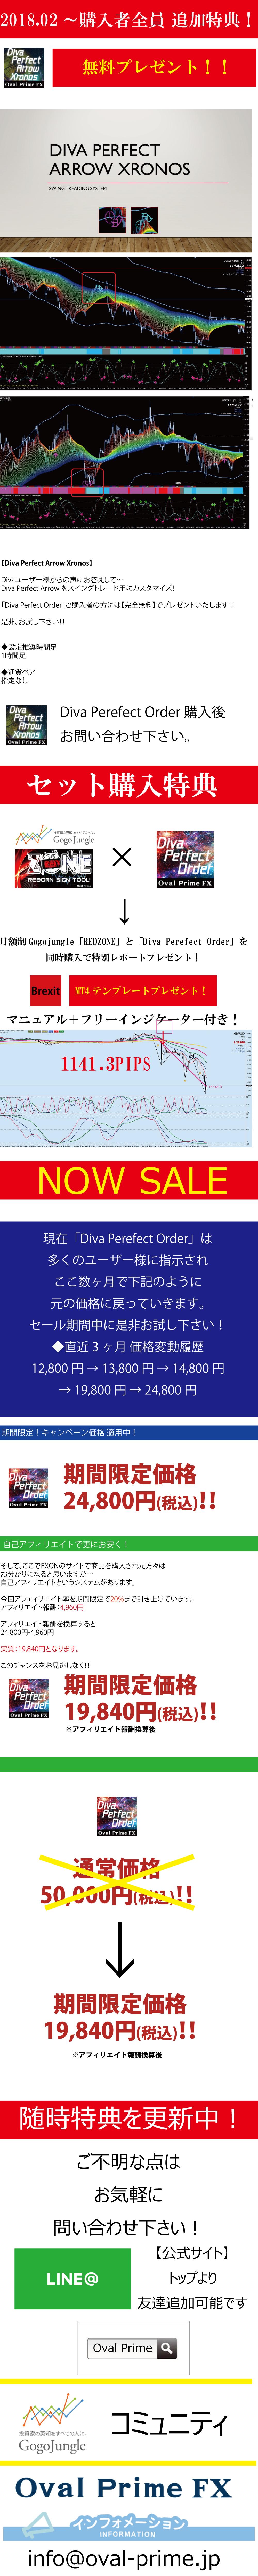 3.Diva-Perfect-<br /> <br /> Order-LP-Master2.jpg